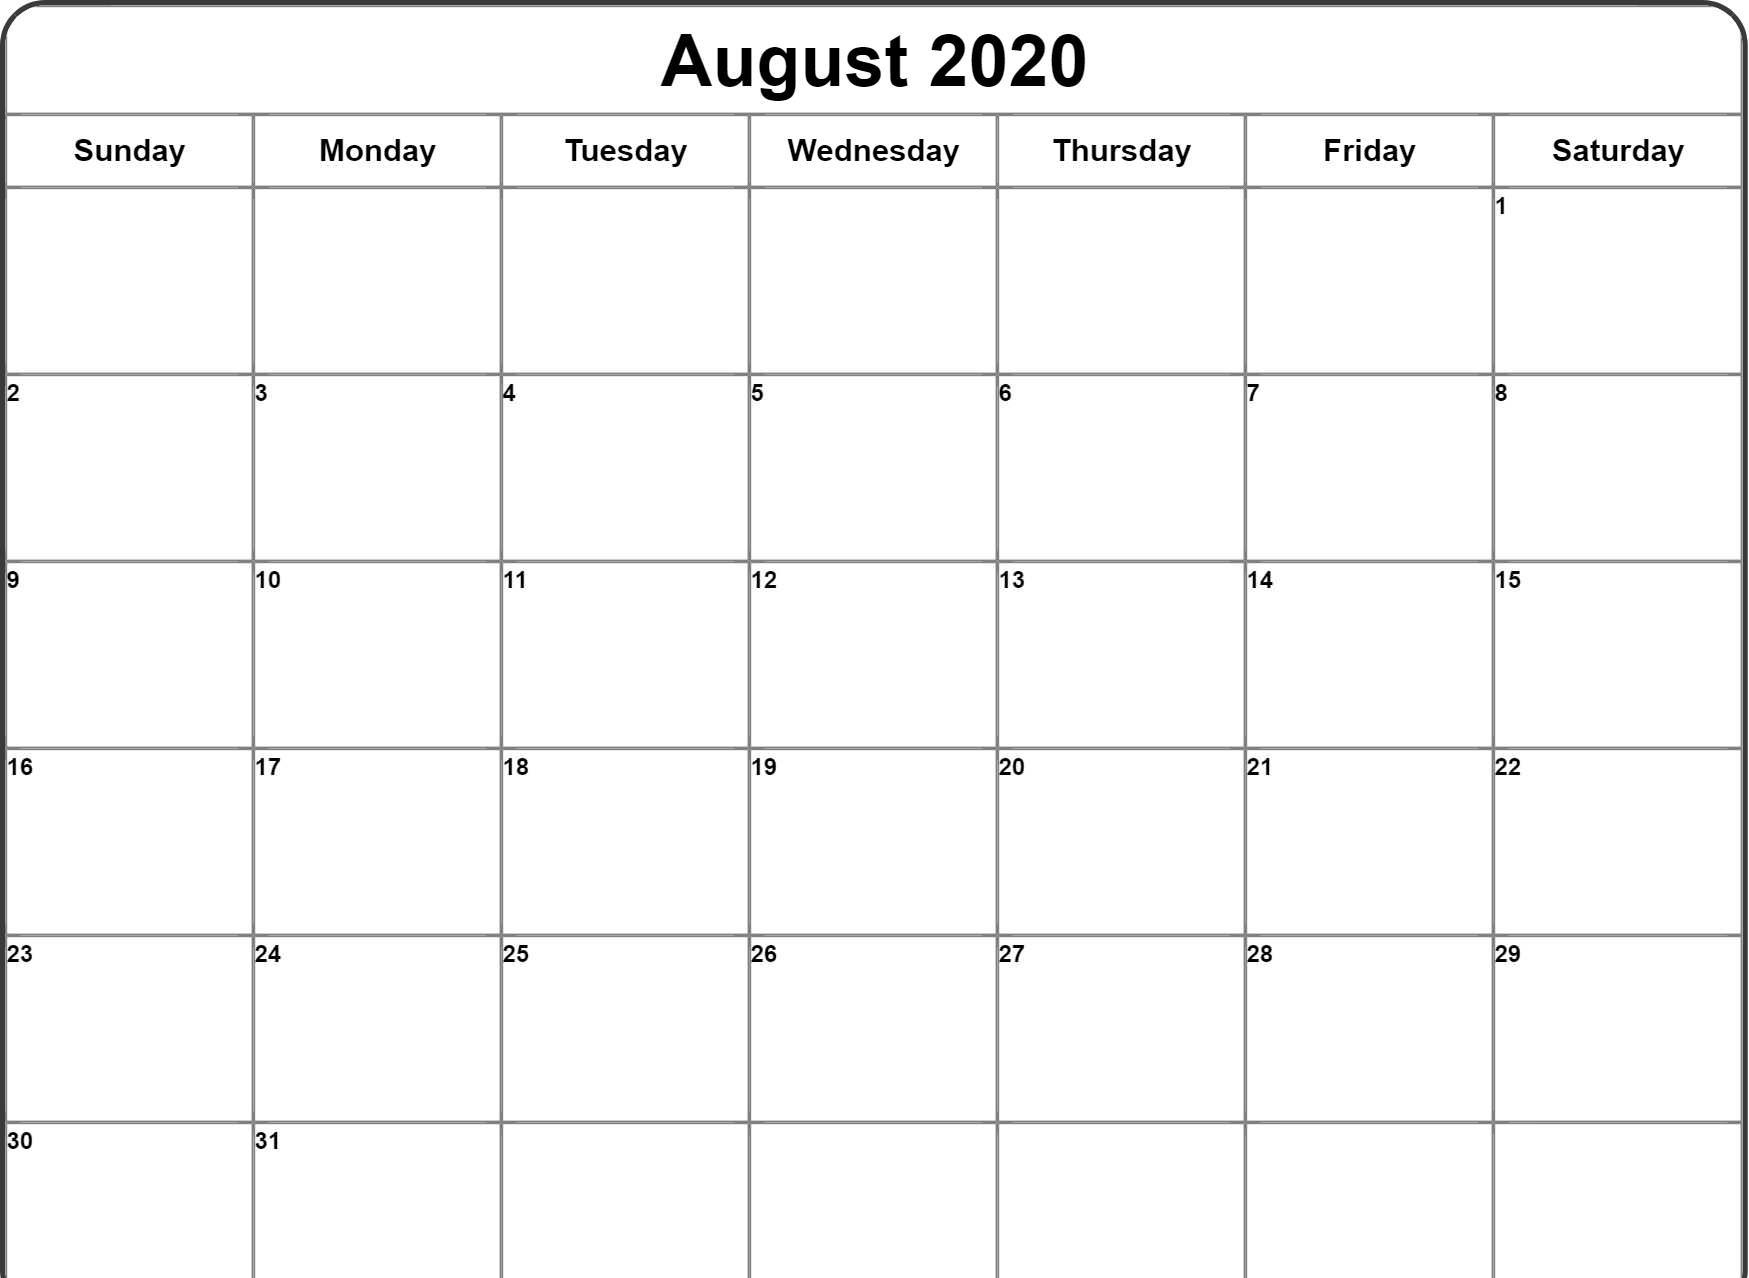 Blank Template Calendar for August 2020 Holidays